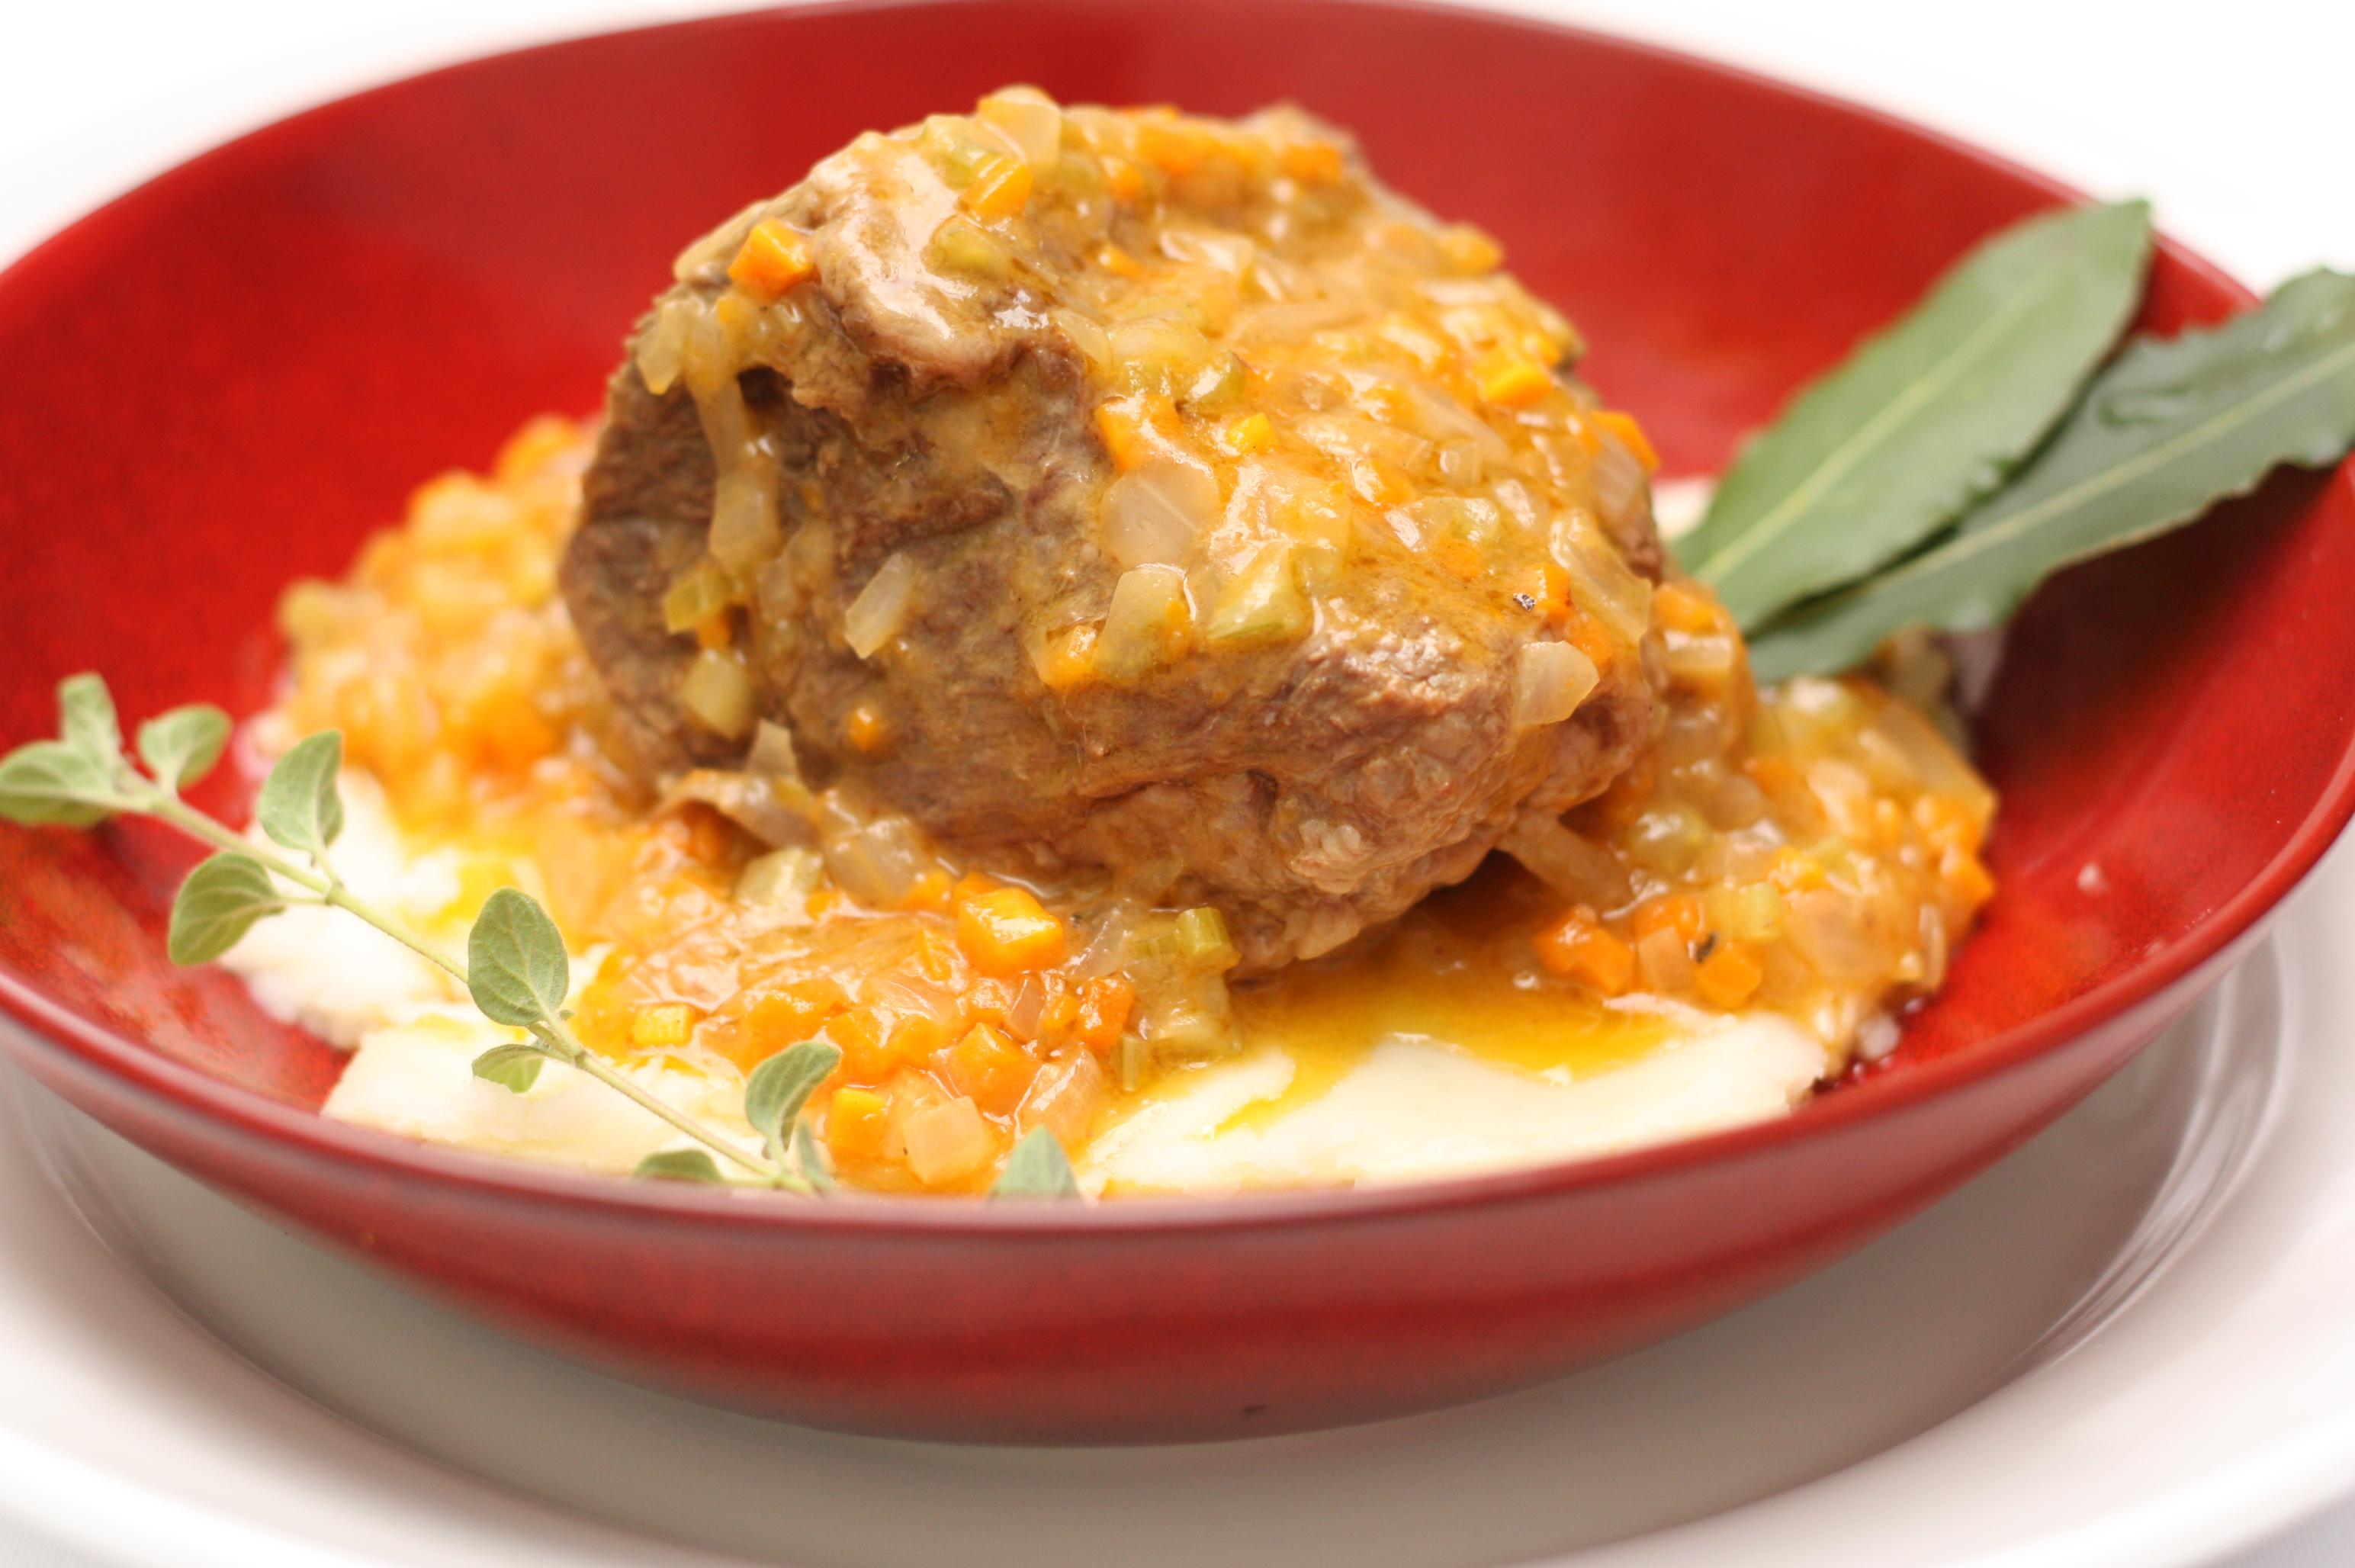 Image of ossobuco from best Italian Restaurant in Miami.